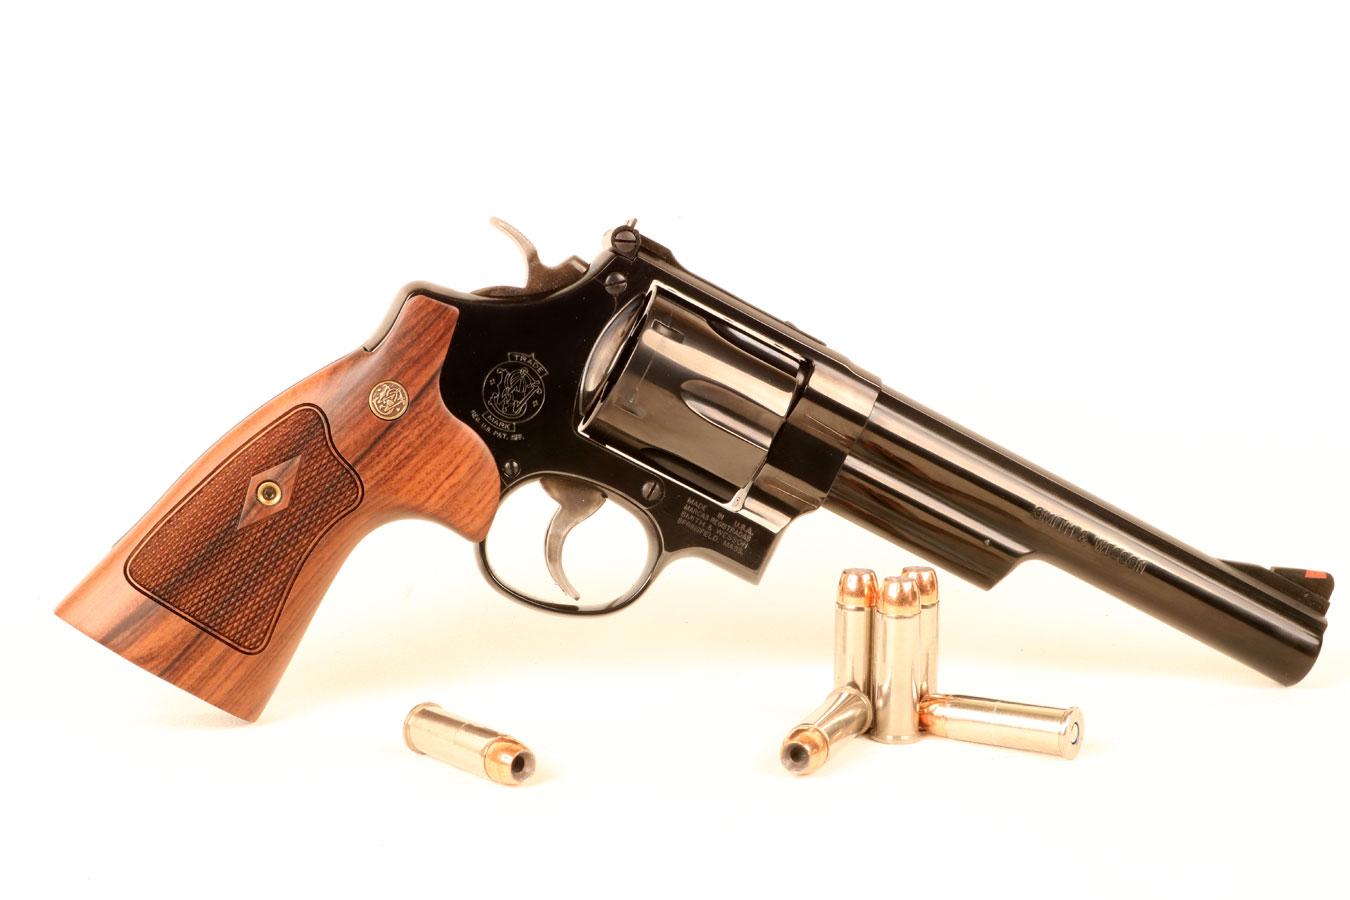 dating min Smith og Wesson revolver muslim dating i Tyskland